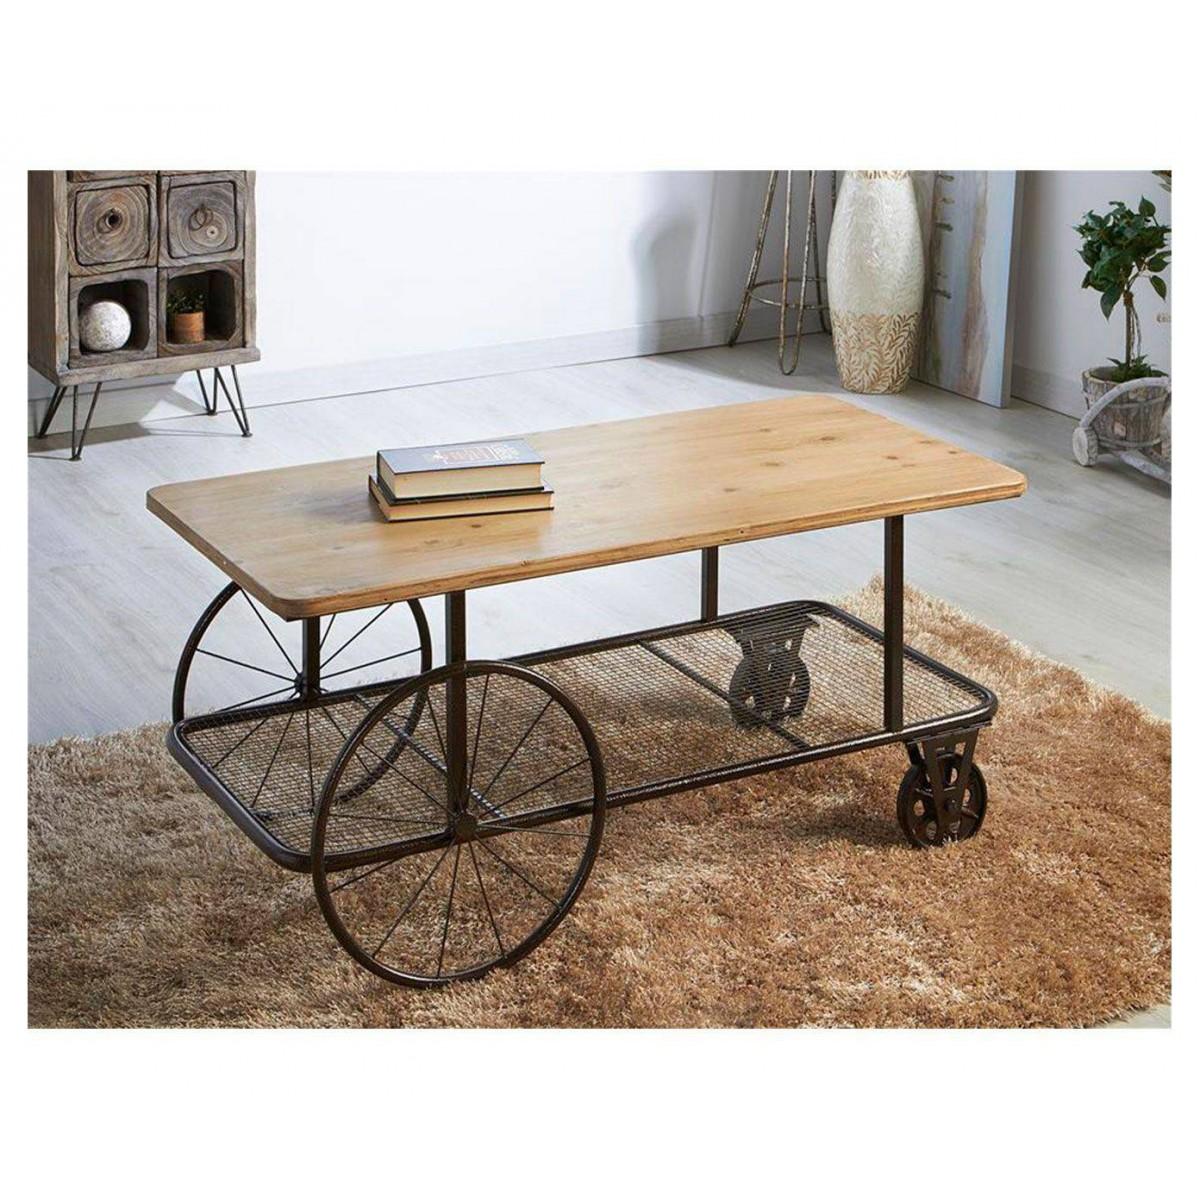 Mesa de centro madera carro metal estilo industrial for Mesa industrial de madera y metal